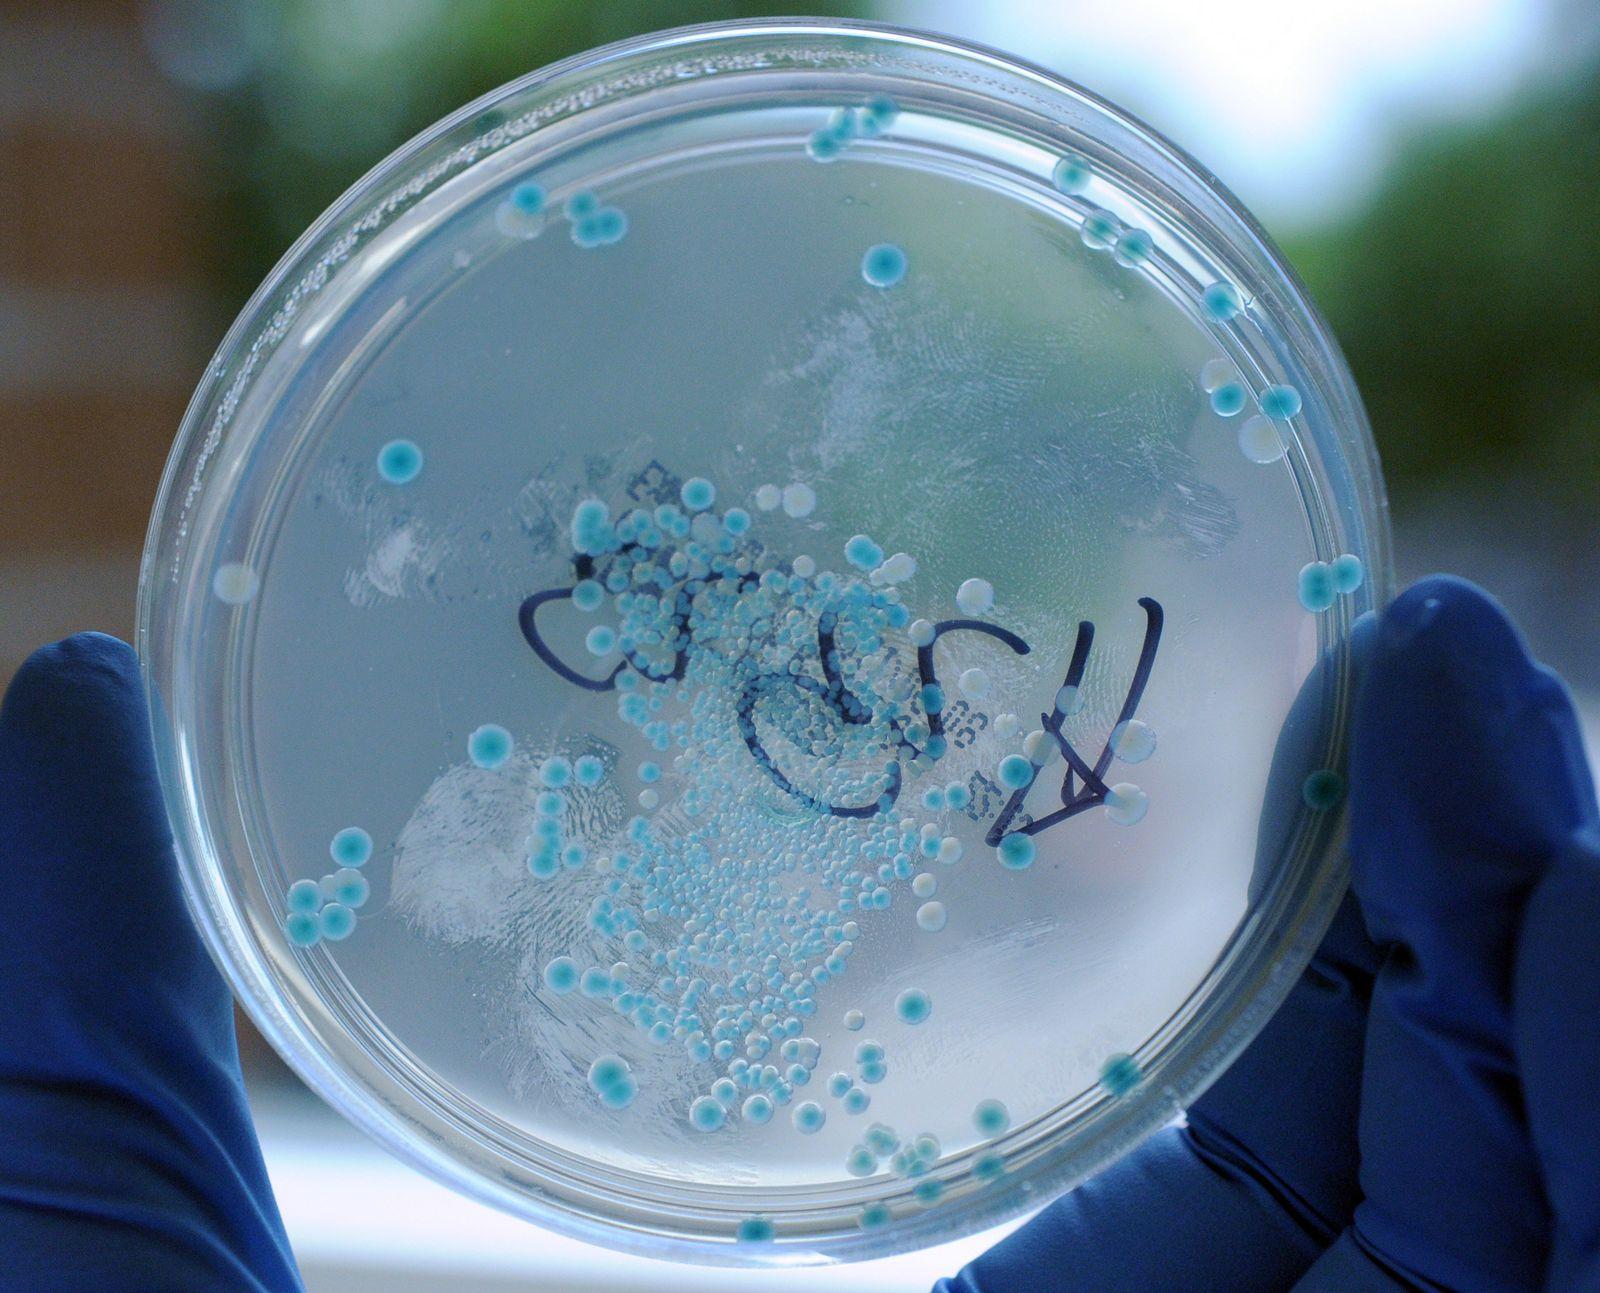 Bakterien E.coli